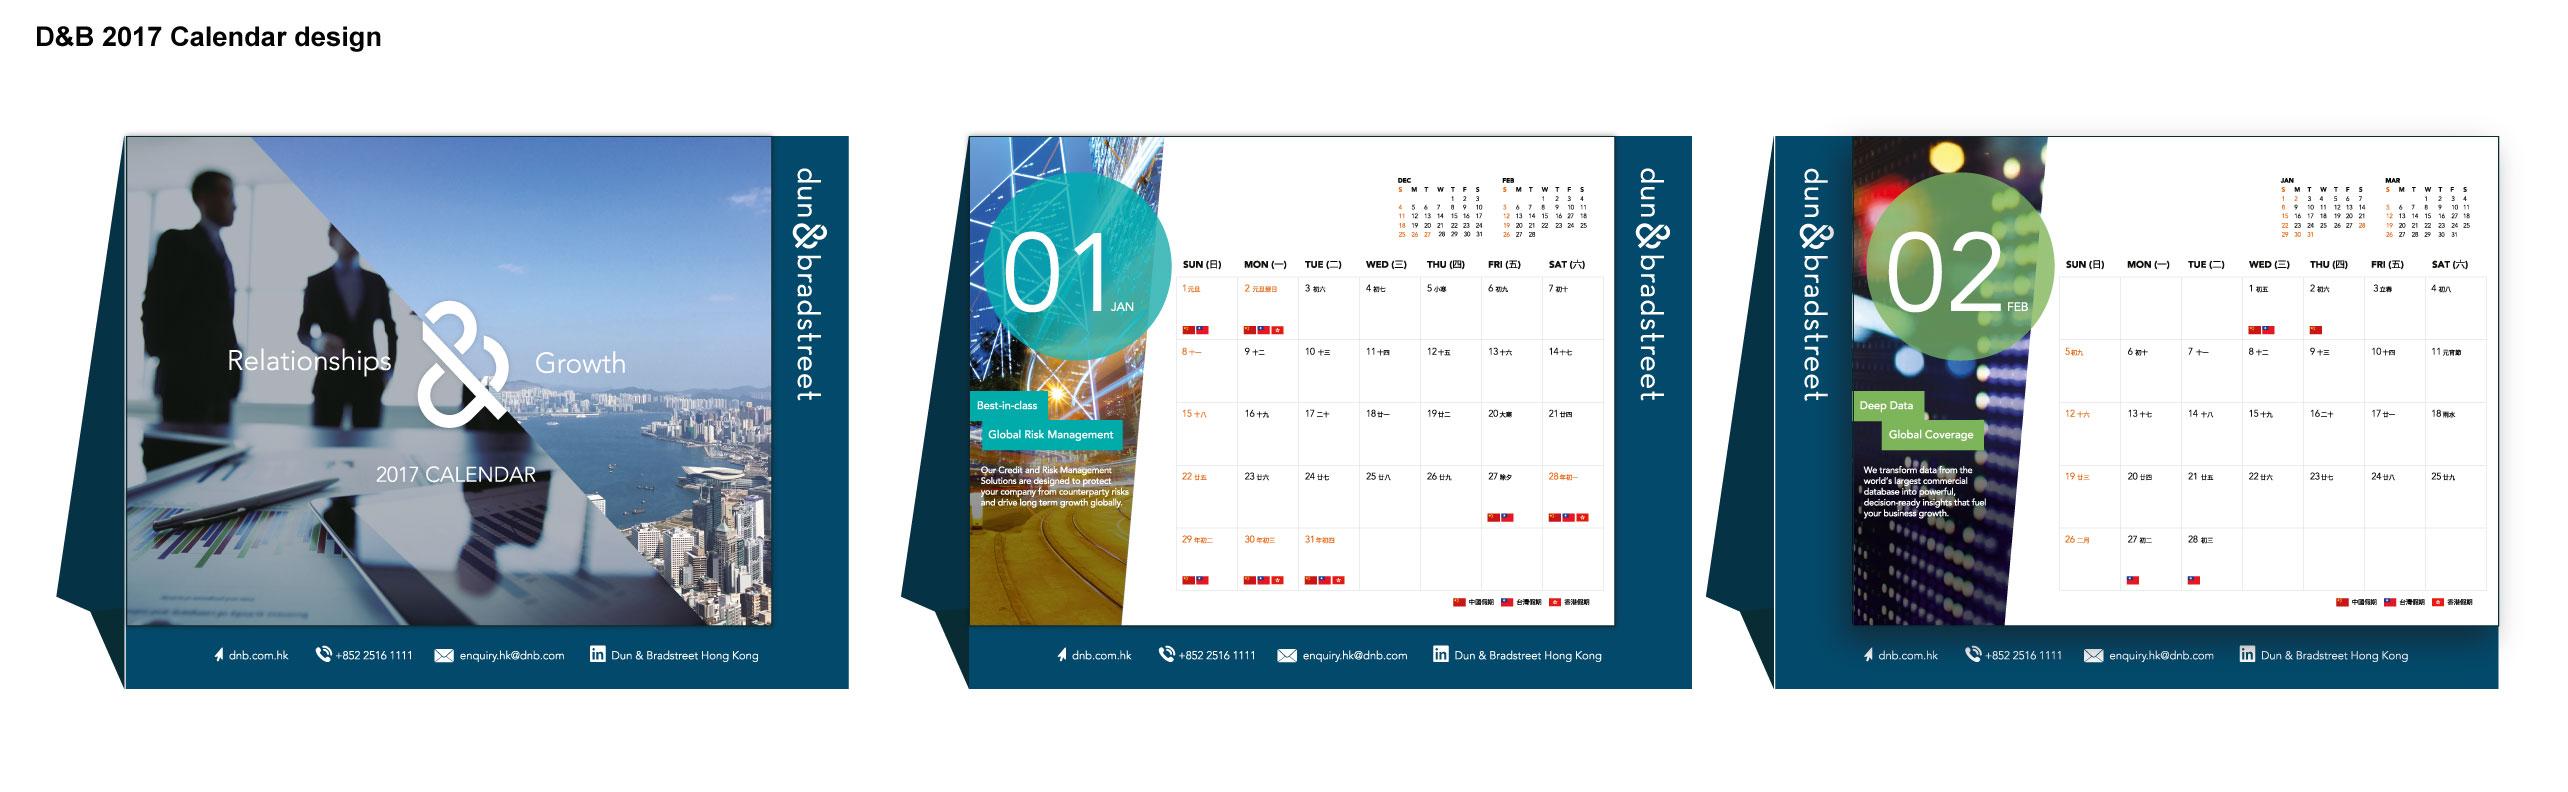 dnb-2017-calendar